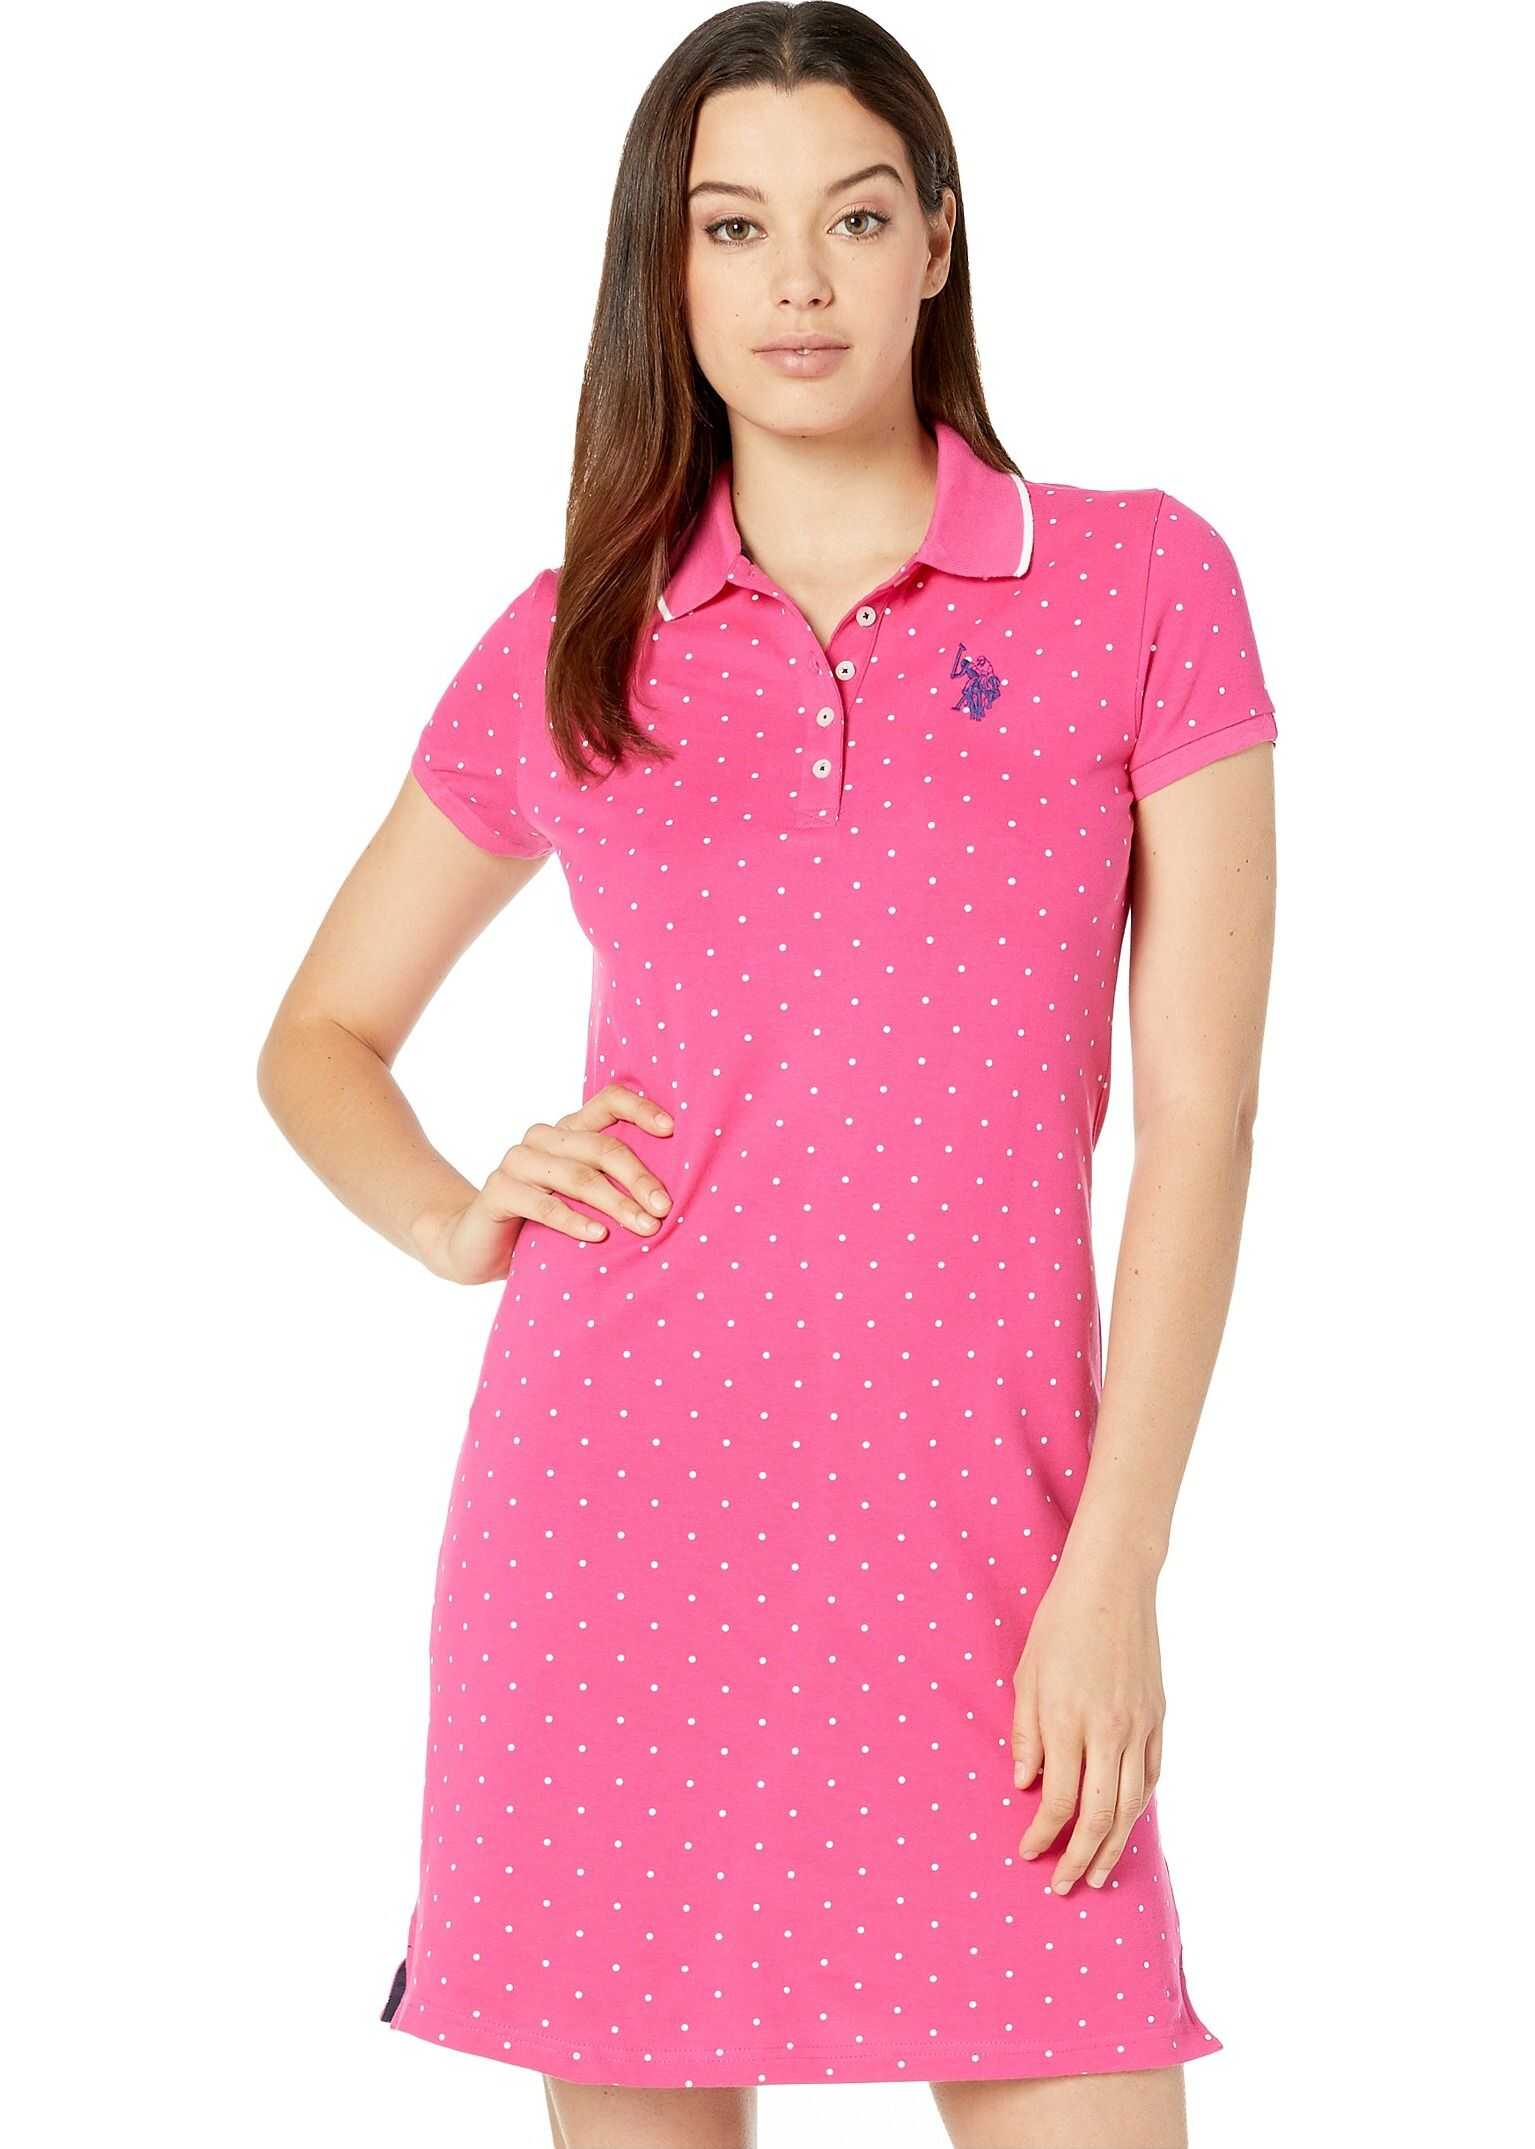 U.S. POLO ASSN. Dot Polo Dress Pink Carmine